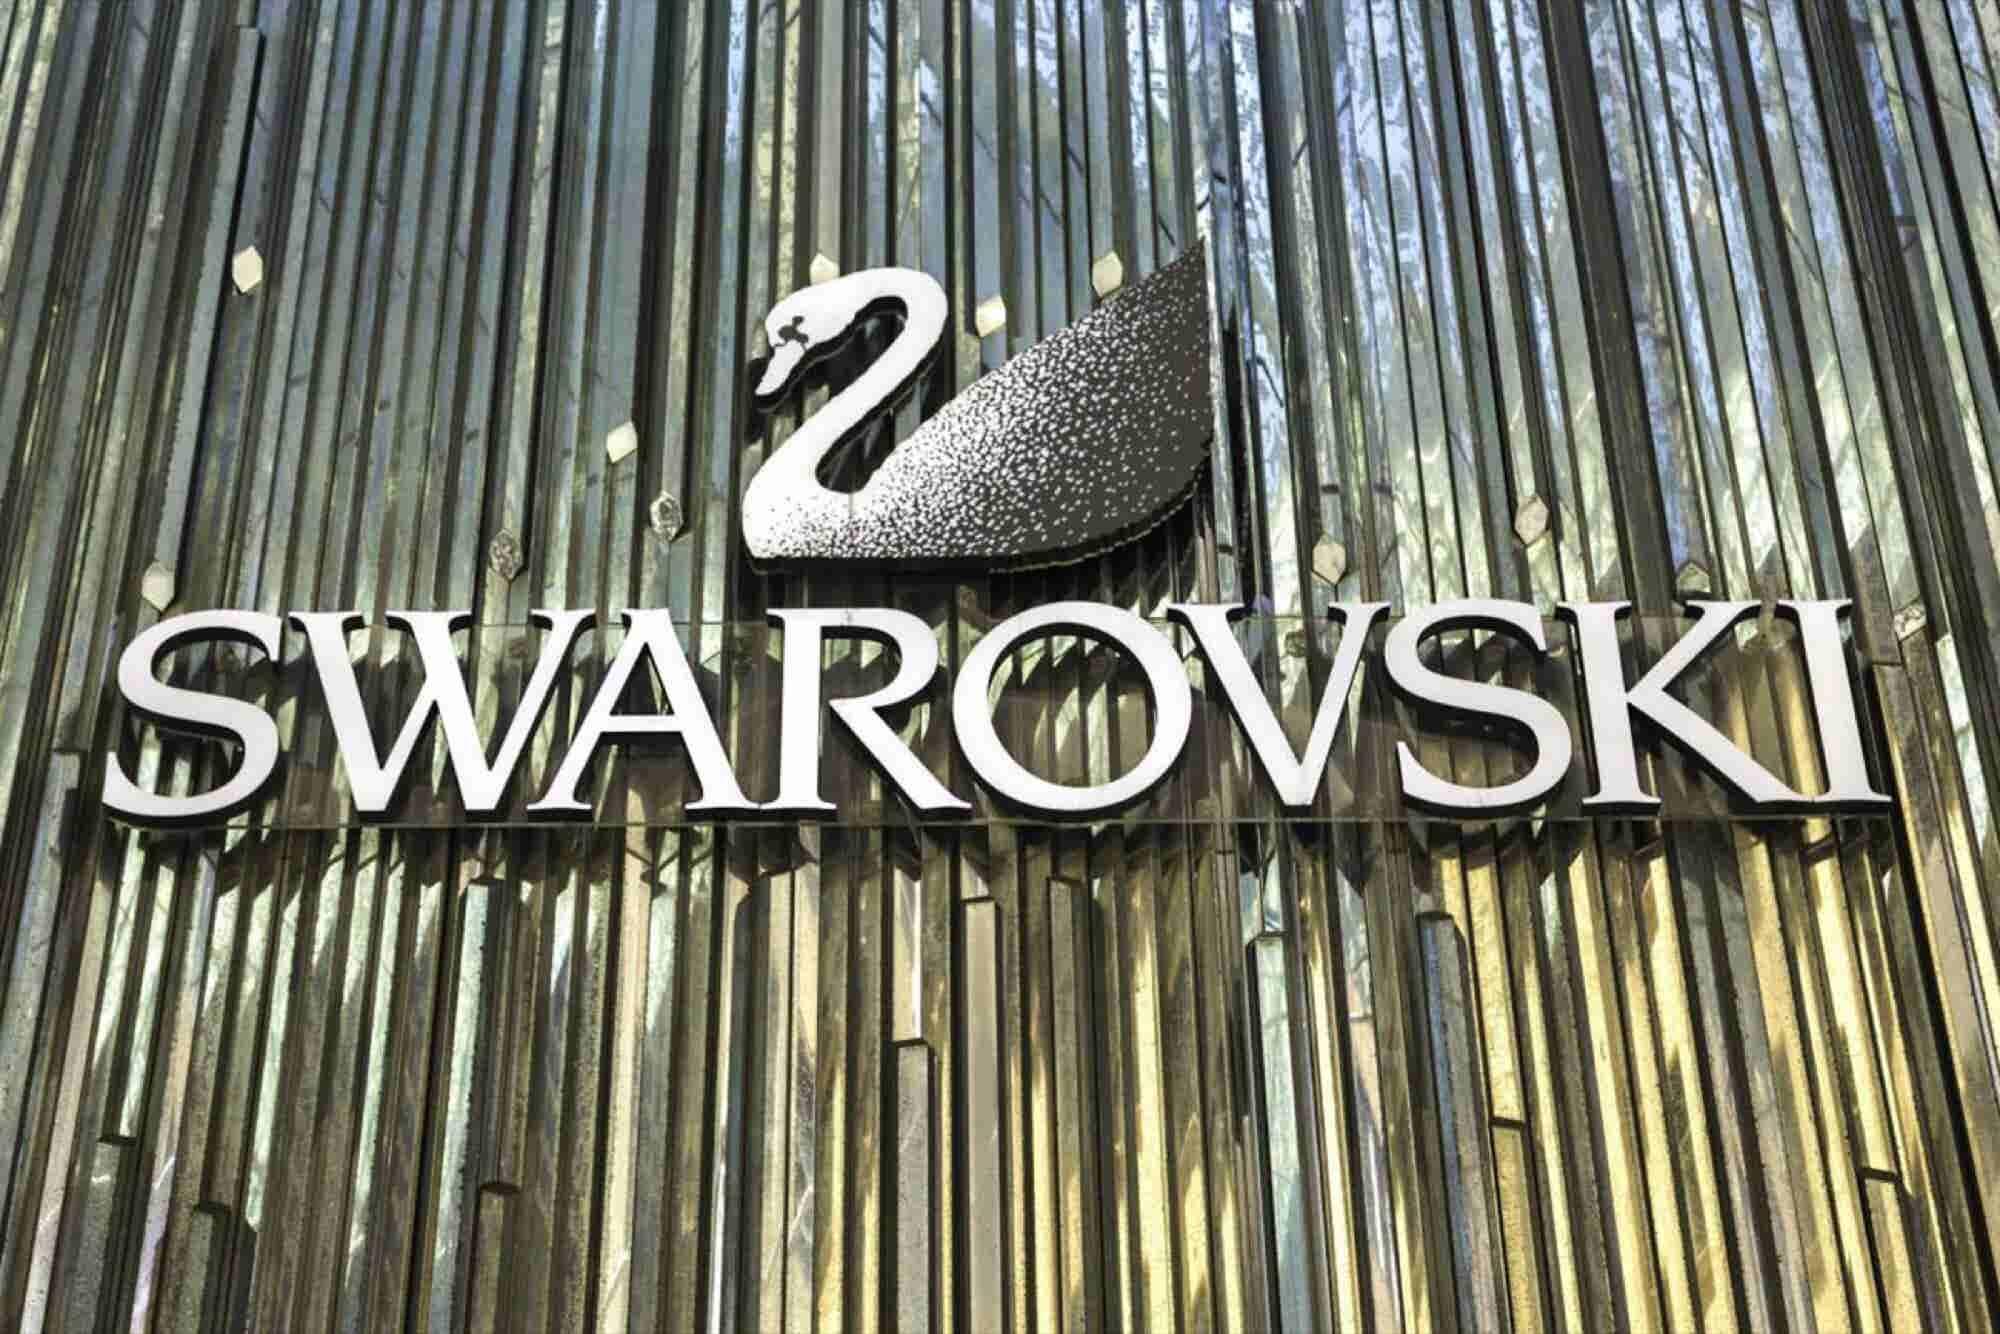 Swarovski is Advertising a $60 Crystal Bracelet on Craigslist's 'Misse...